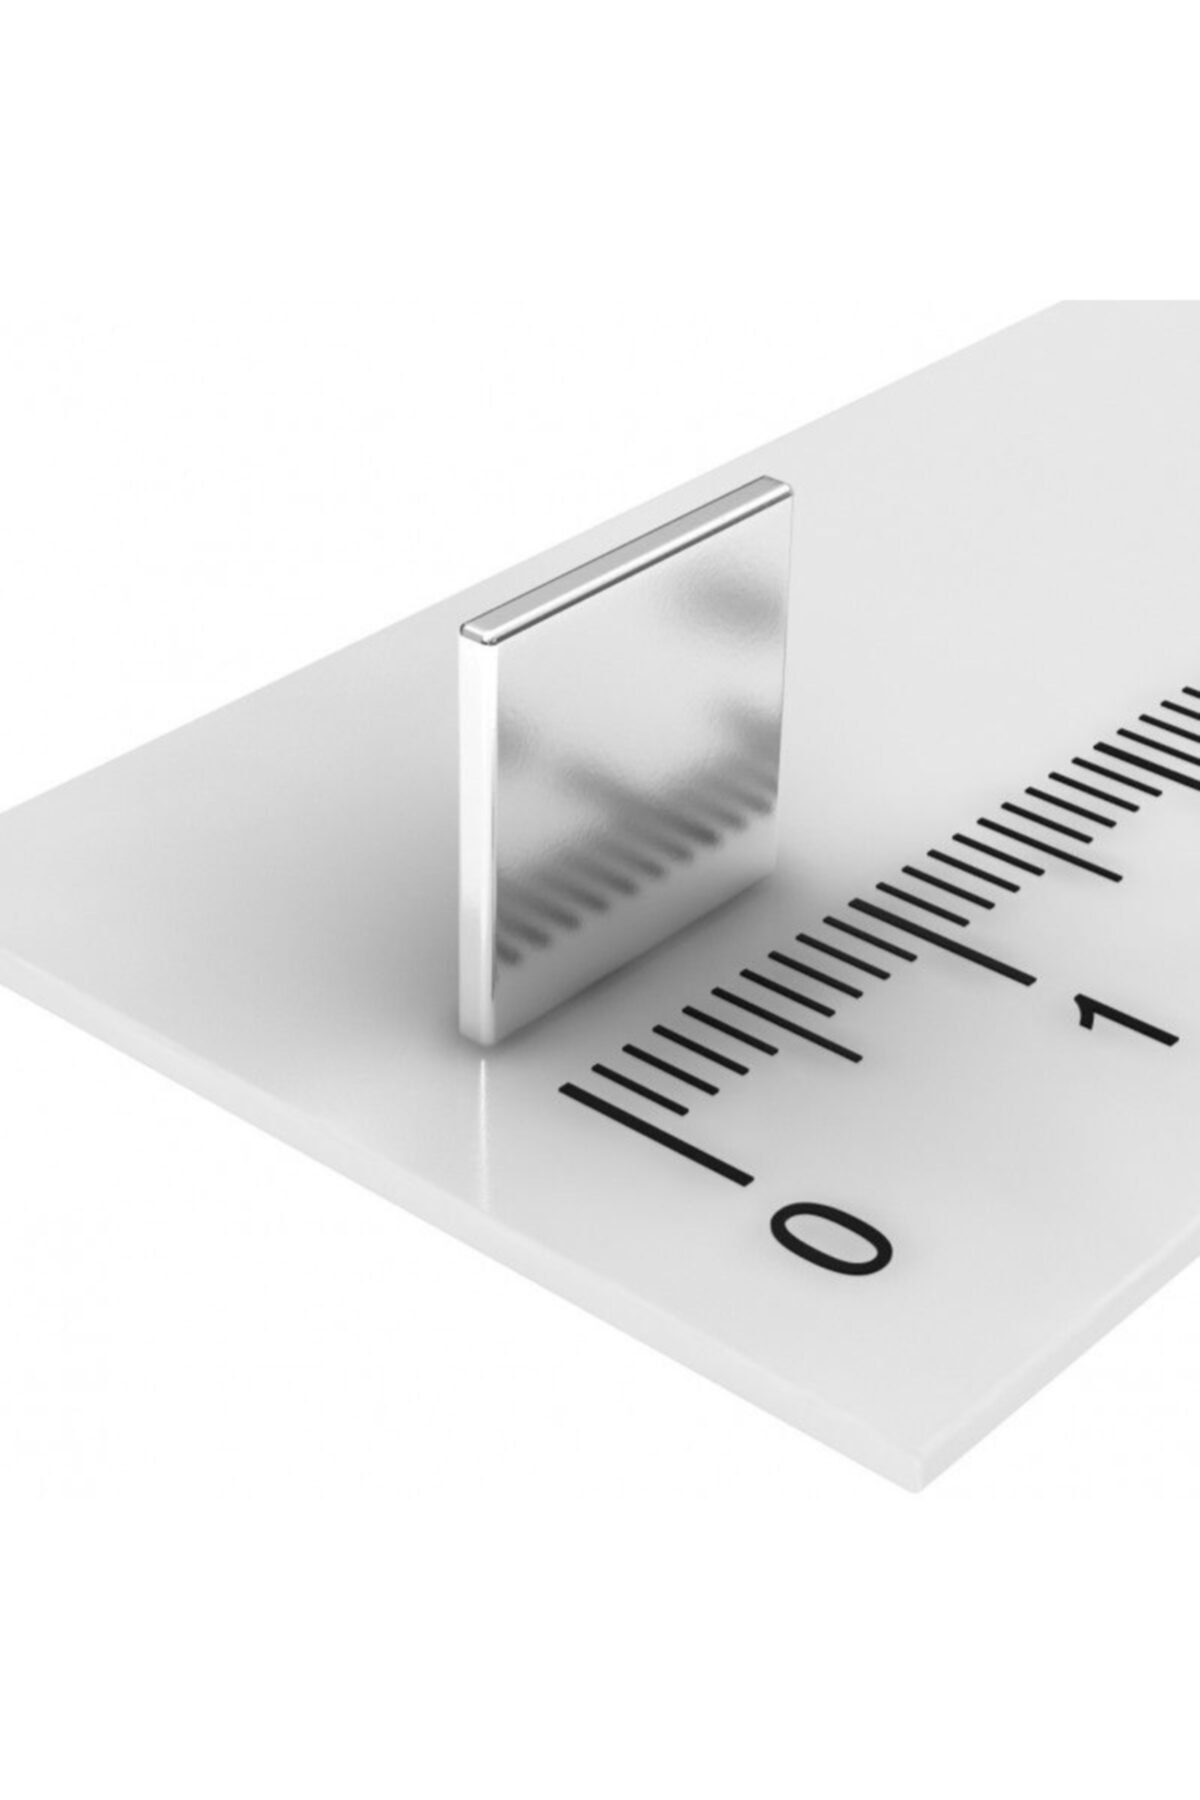 Dünya Magnet 50 Adet 10x10x1 Süper Güçlü Kare Neodyum Mıknatıs Magnet (50'li Paket) 2